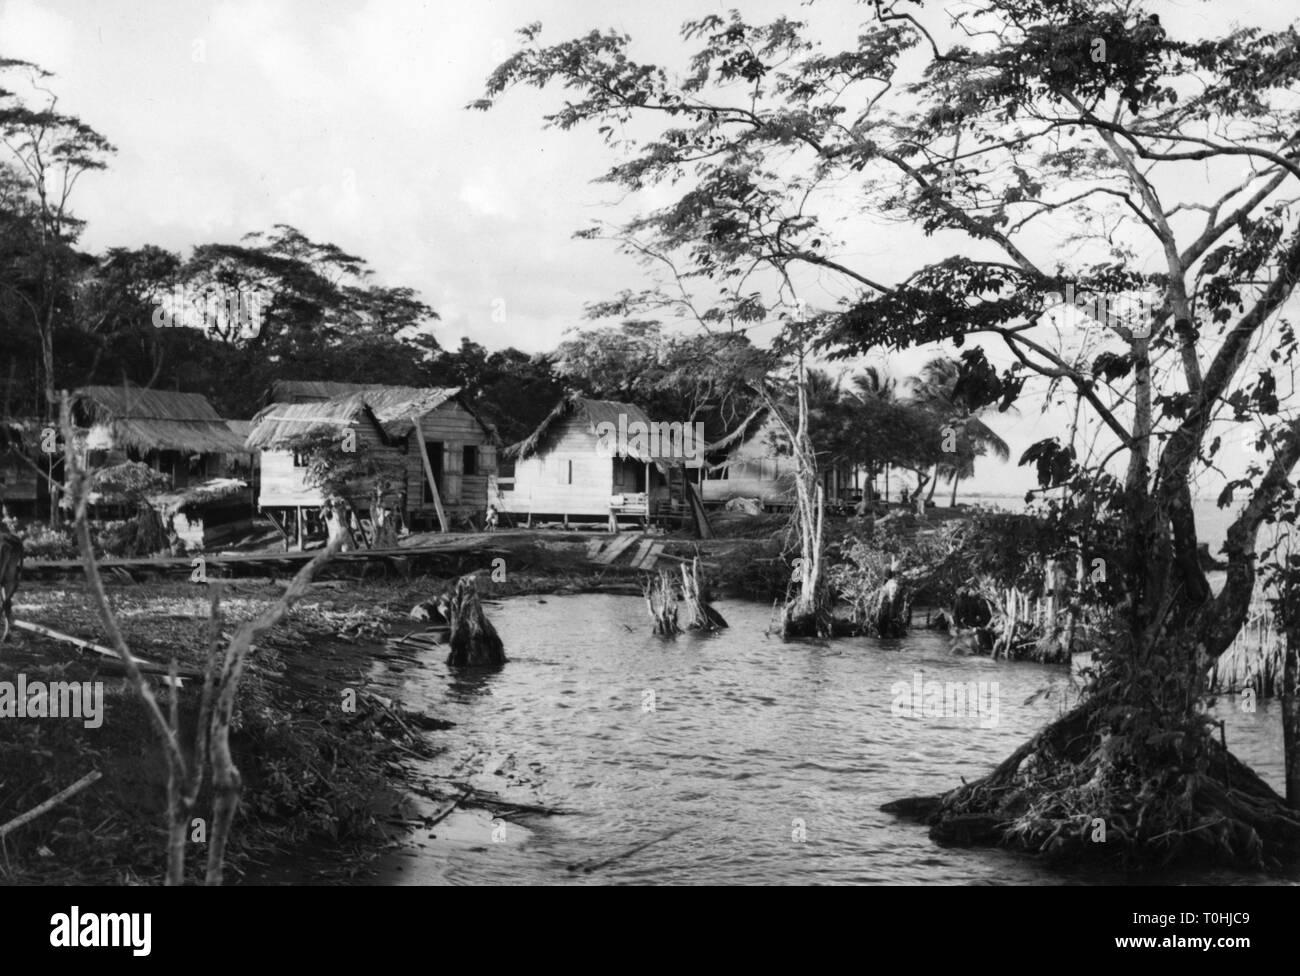 Geographie/Reisen, Costa Rica, landschaften, Hütten im Waterside, 1960er Jahre, Additional-Rights - Clearance-Info - Not-Available Stockbild